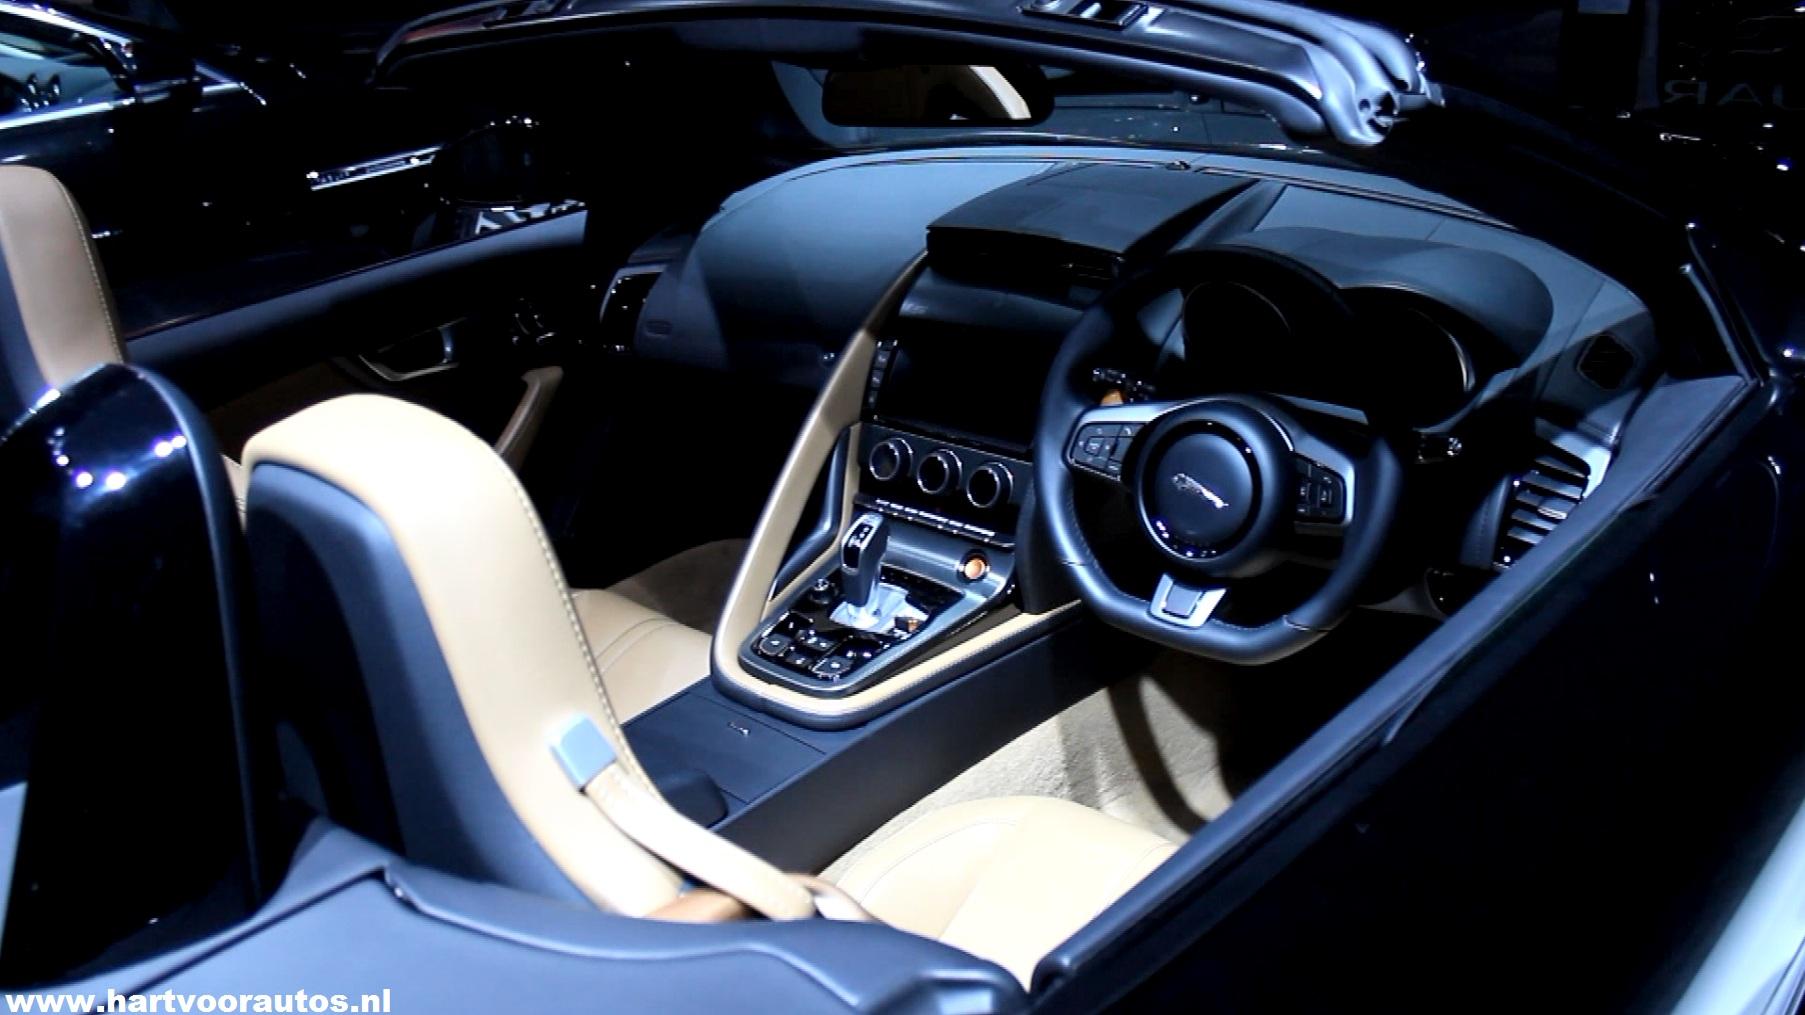 Jaguar F-type V8 - www.hartvoorautos.nl